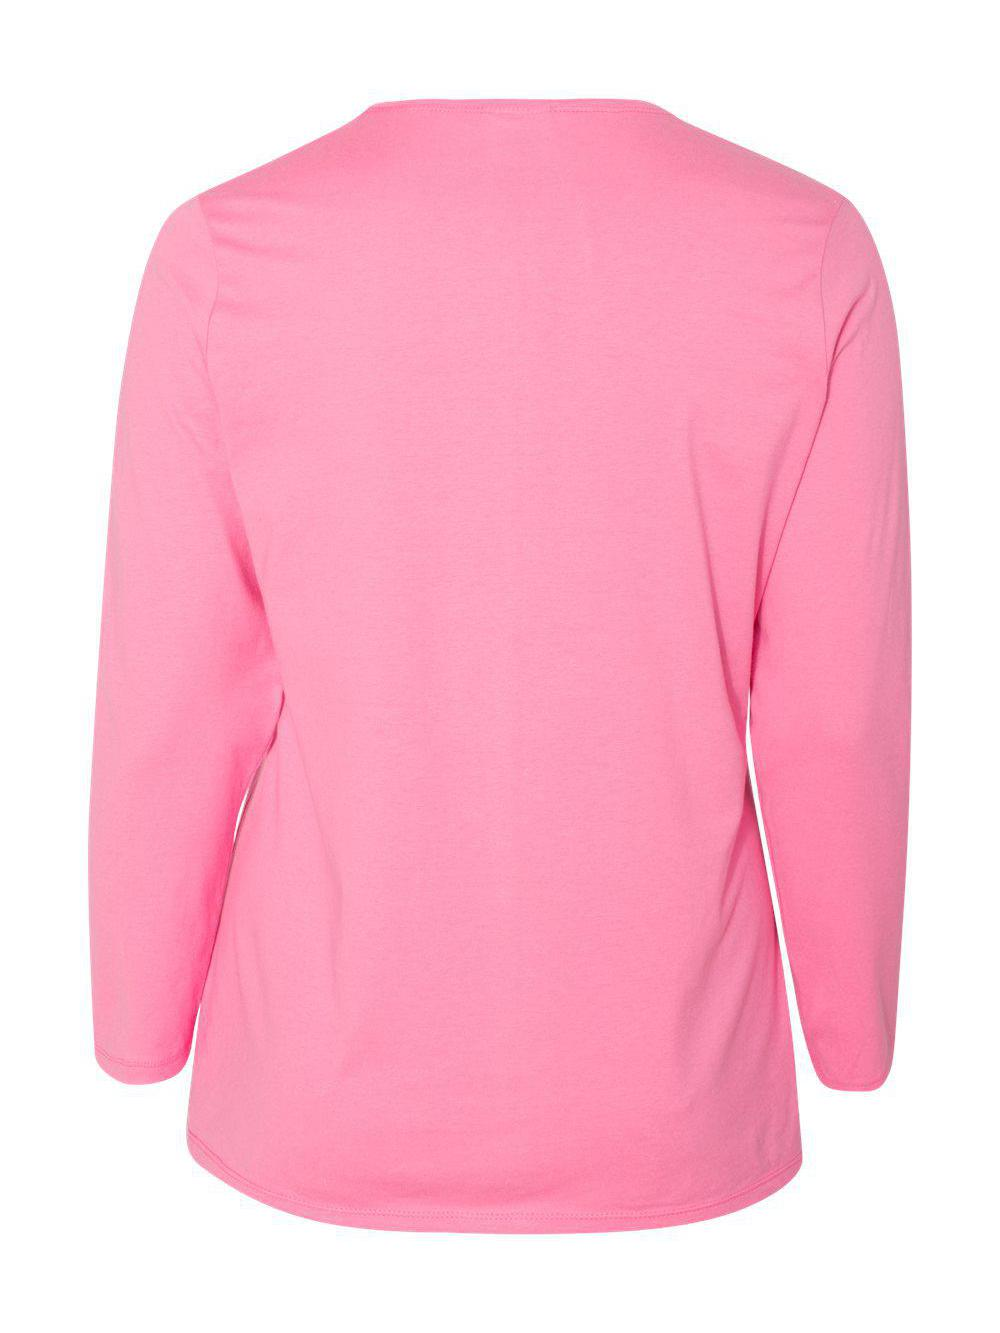 Just-My-Size-Women-039-s-Long-Sleeve-T-Shirt-JMS40 thumbnail 16